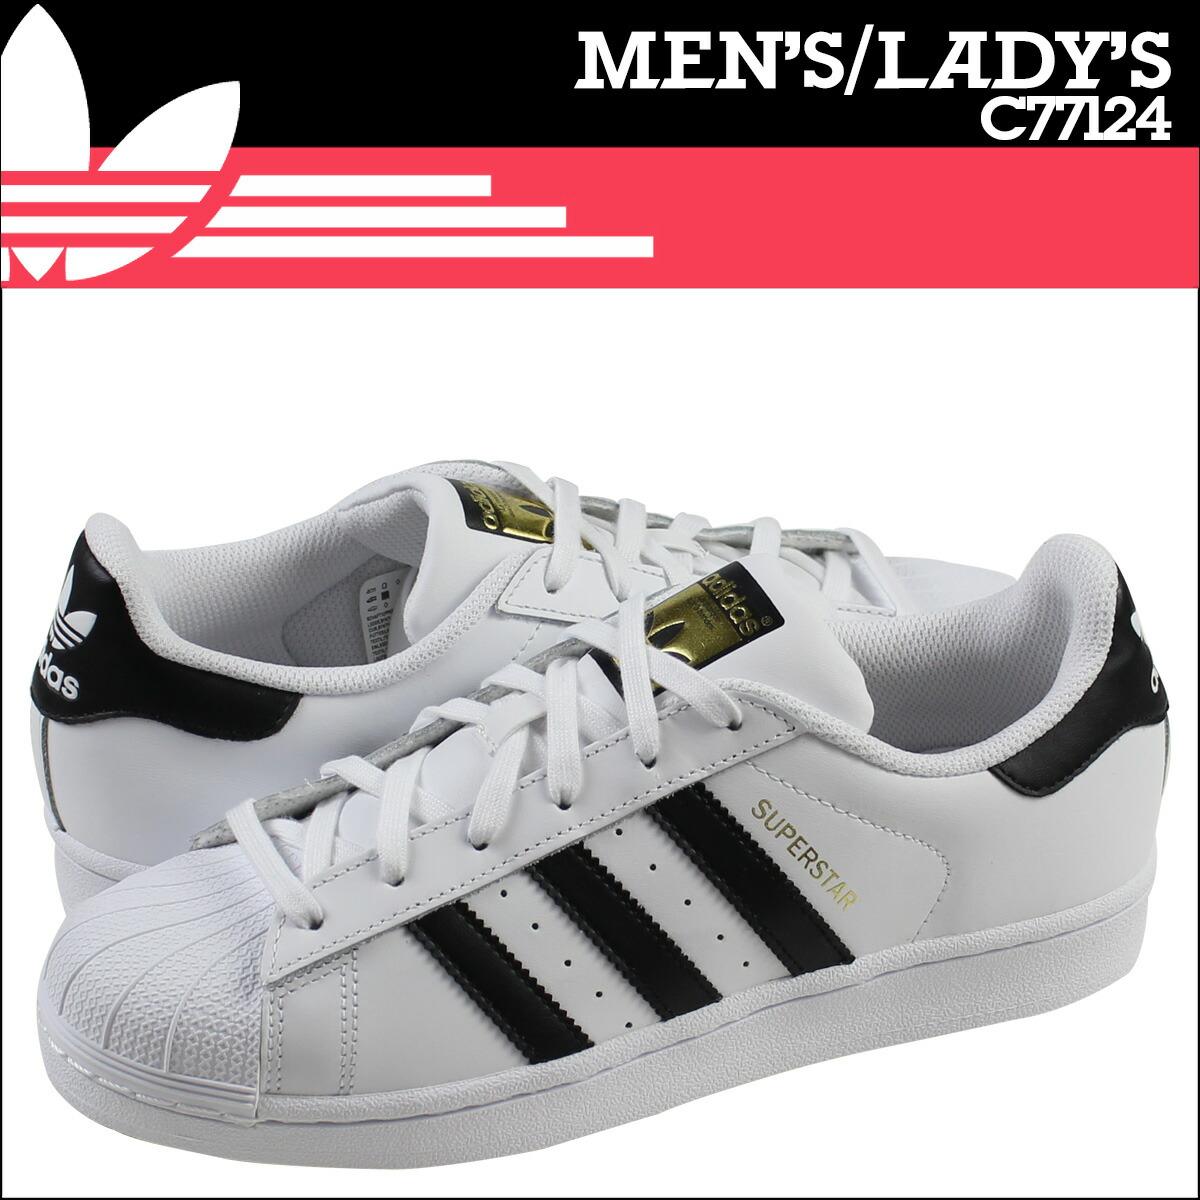 Adidas Superstar Superstar Superstar Fondazione Uomini Scarpe 42e982